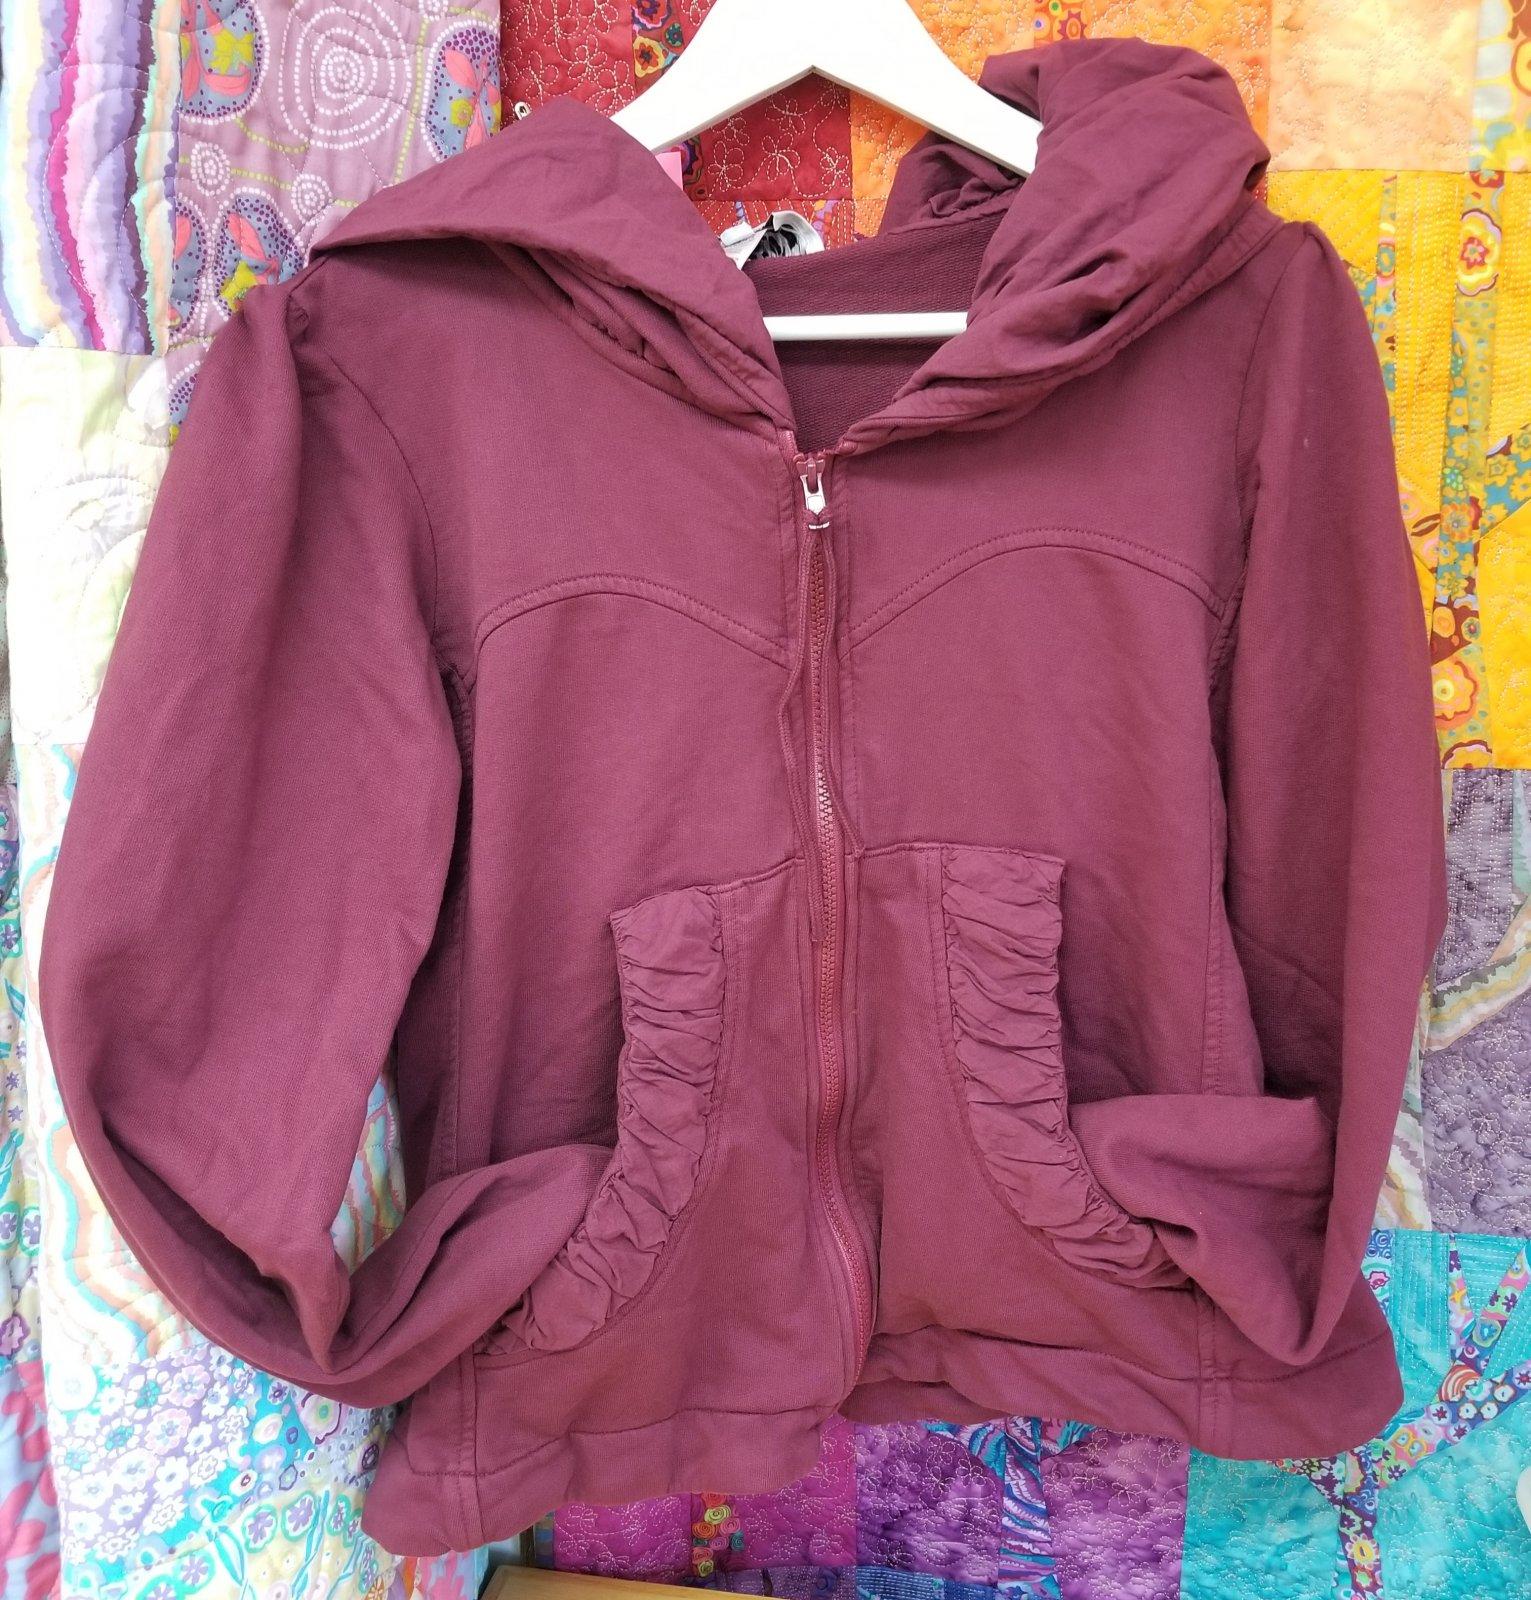 Beet Cloak Hoodie by Prairie Underground sizes Medium-Extra Large